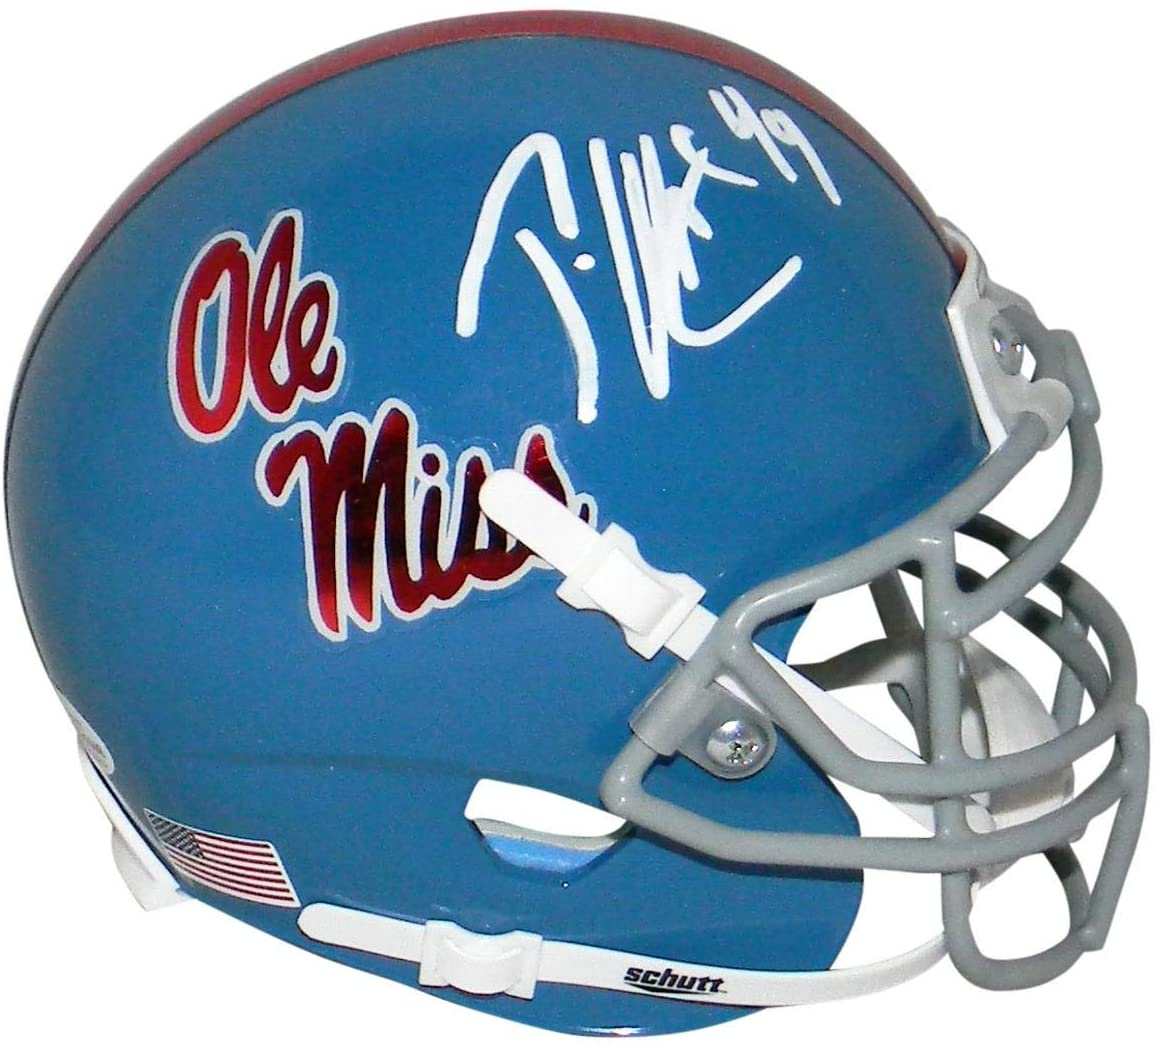 Patrick Willis Autographed Ole Miss Mississippi Rebels Mini Helmet Beckett - Beckett Authentication - Autographed College Mini Helmets